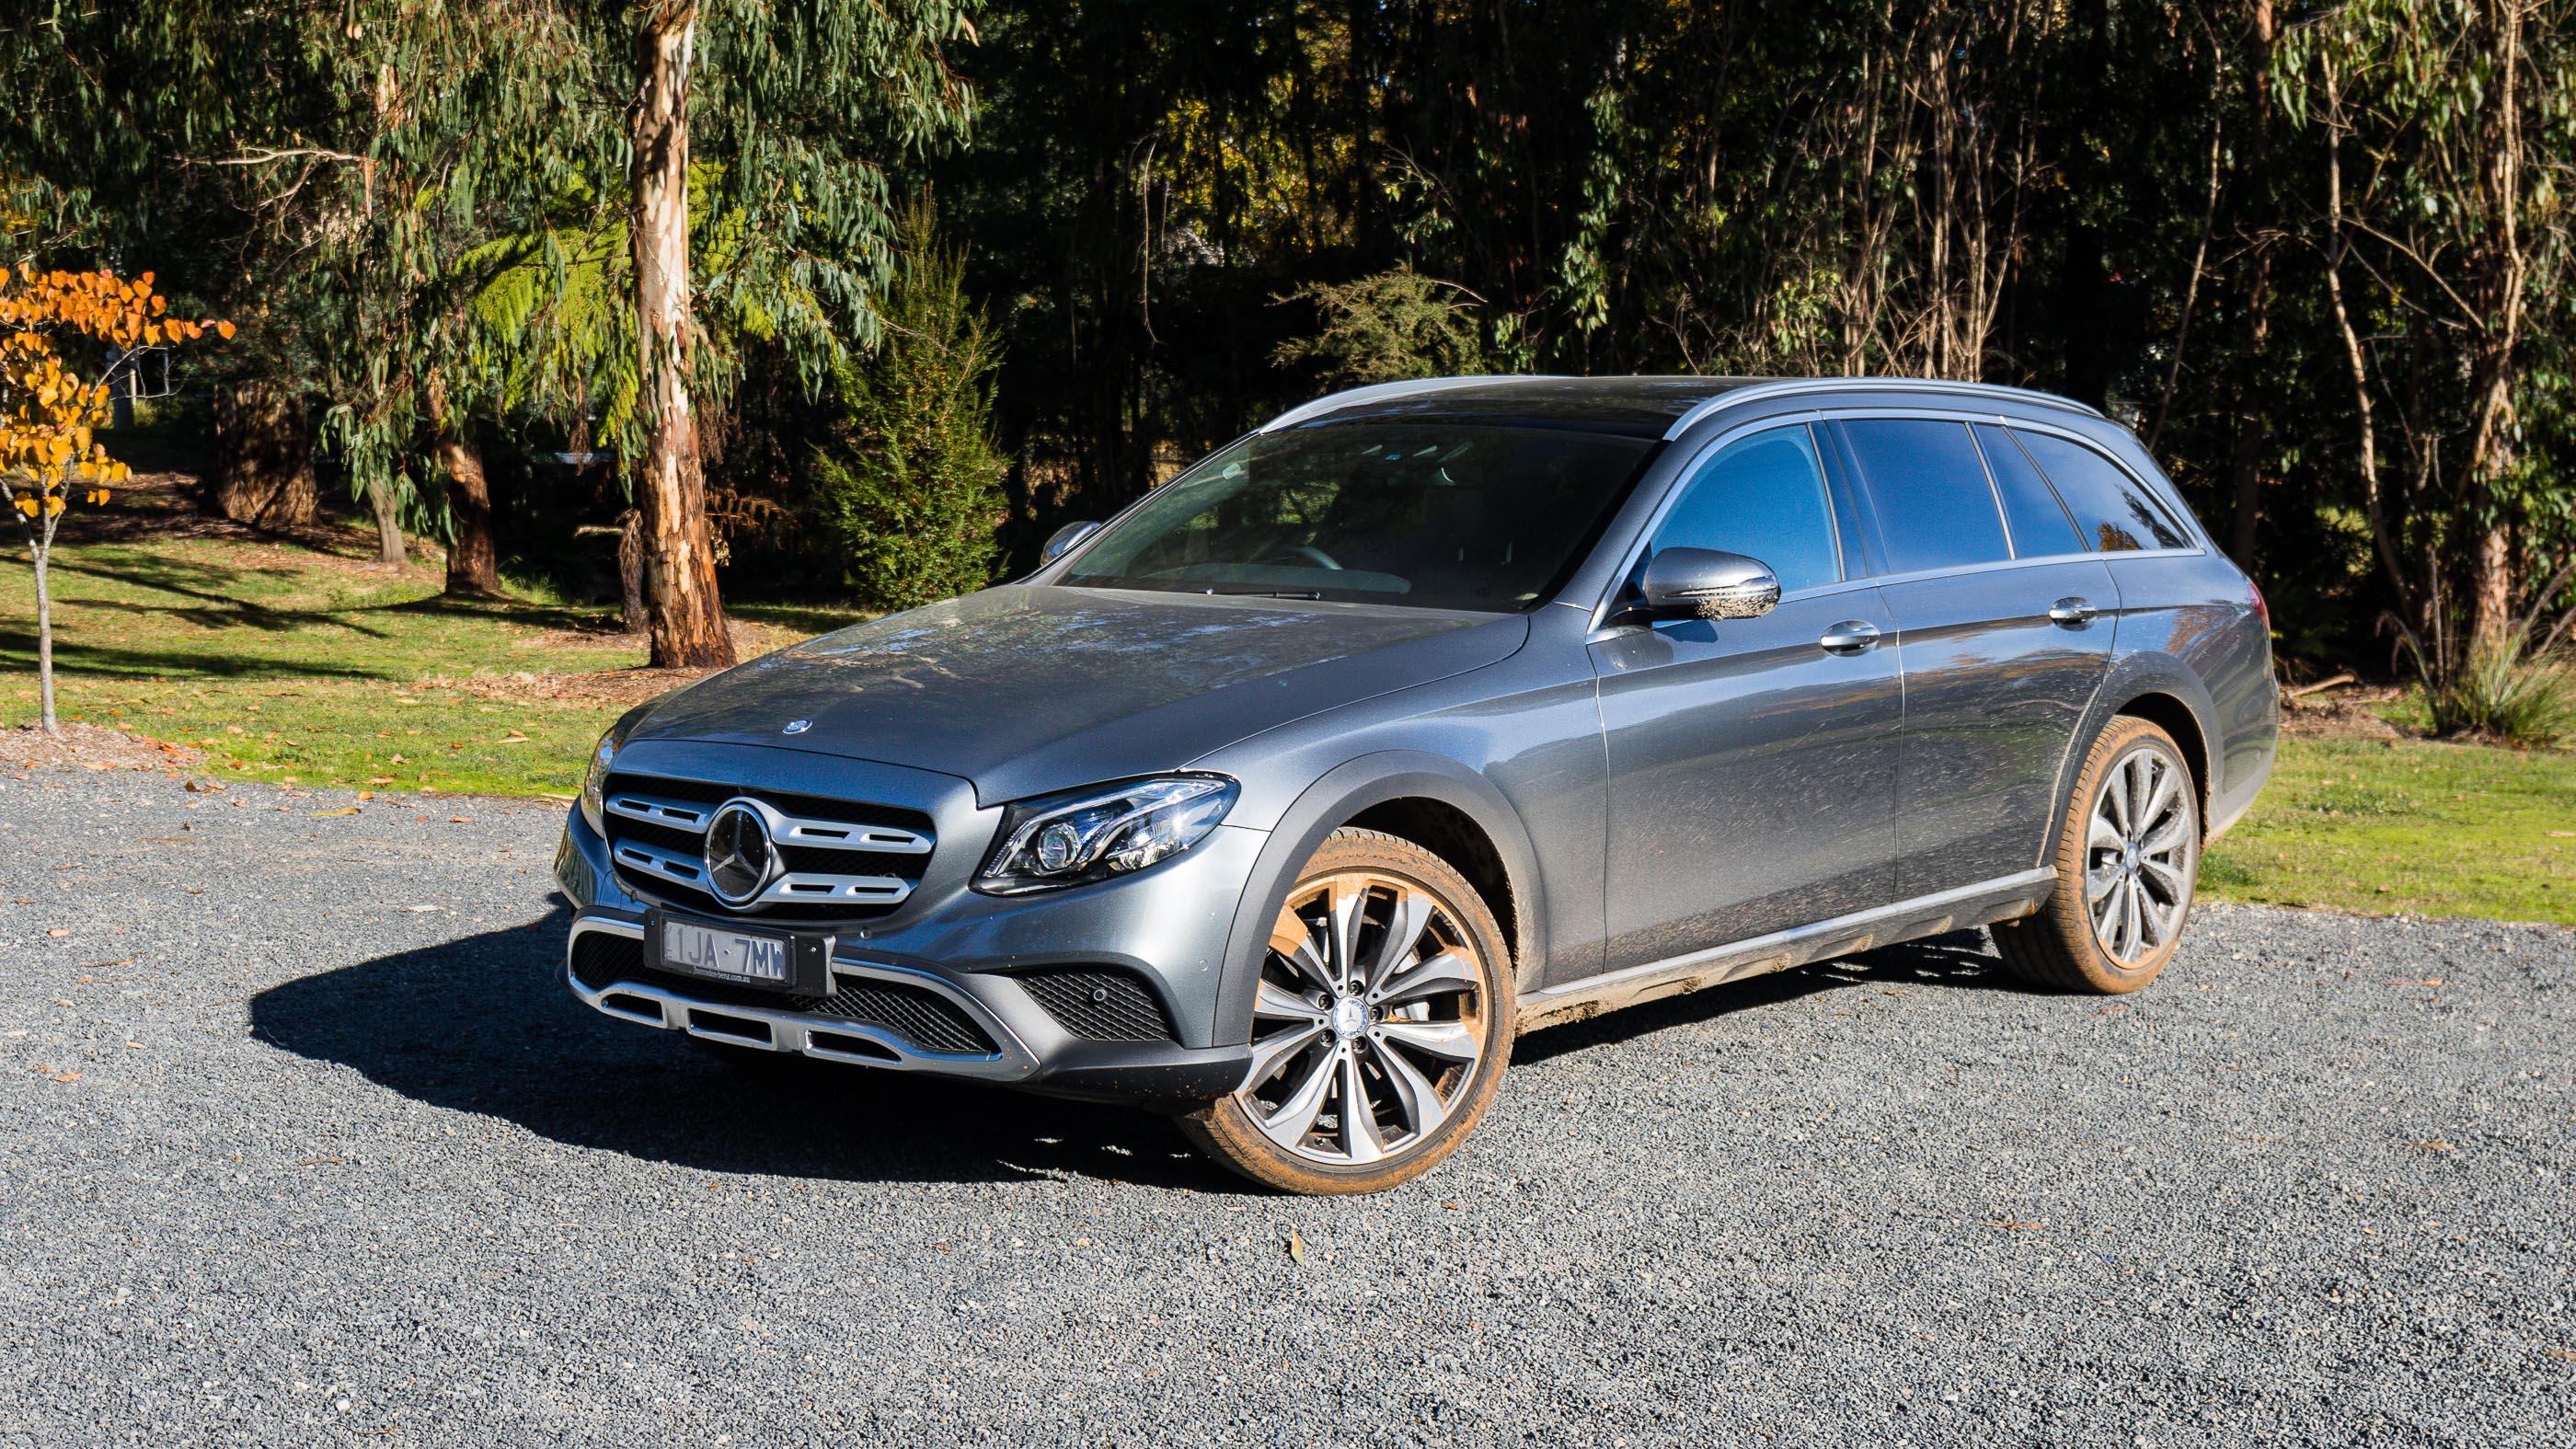 2017 mercedes benz e220d all terrain review caradvice for Mercedes benz all